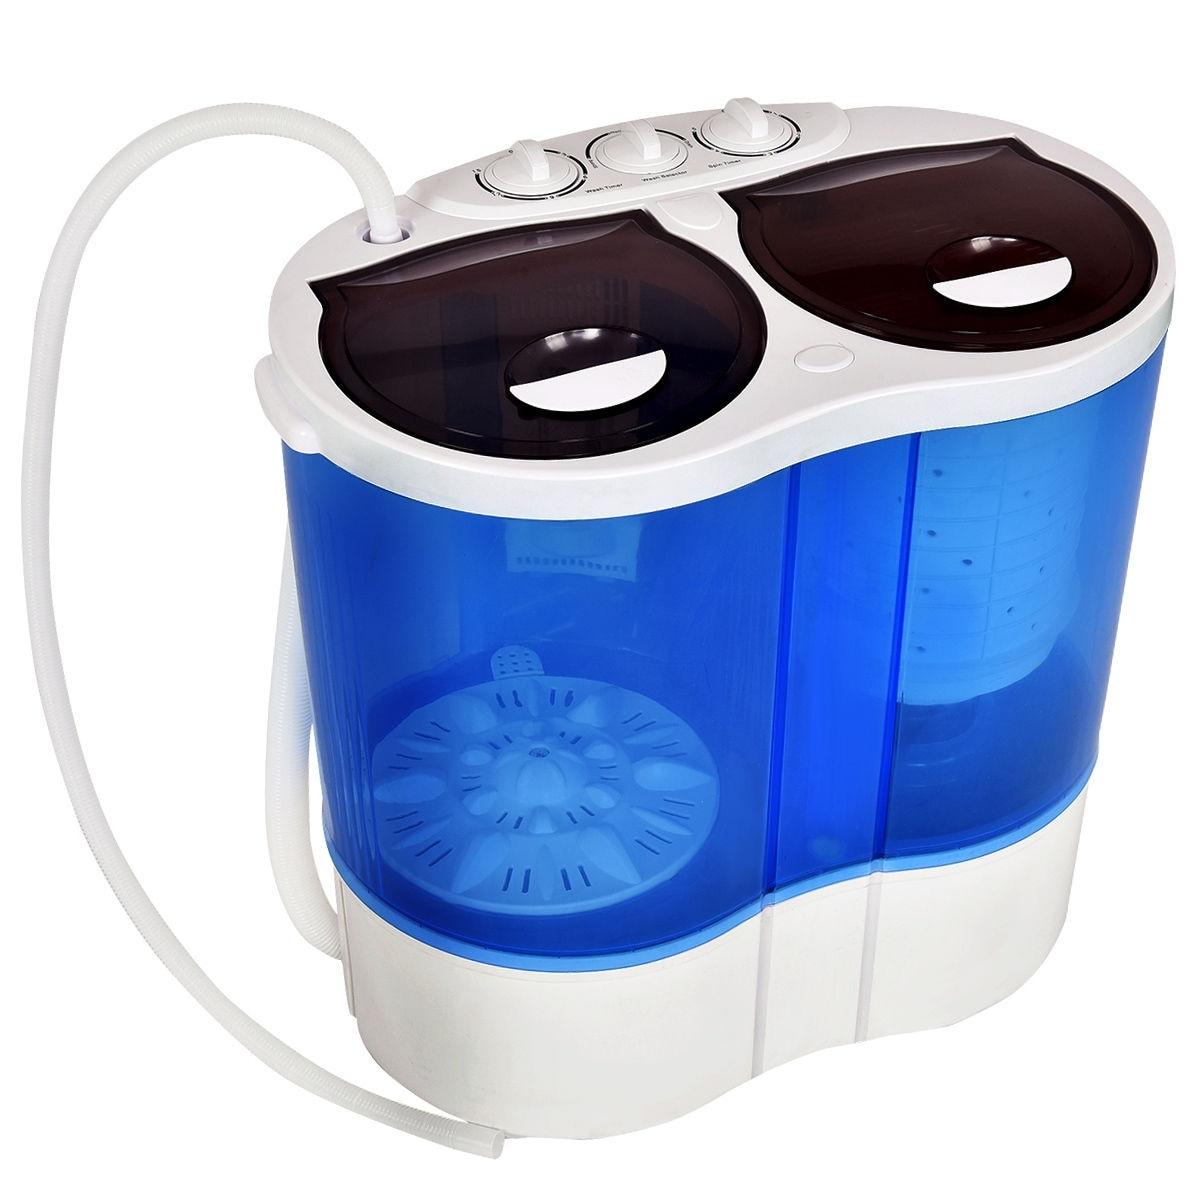 Shop Costway Portable Mini Washing Machine Compact Twin Tub 15lb ...